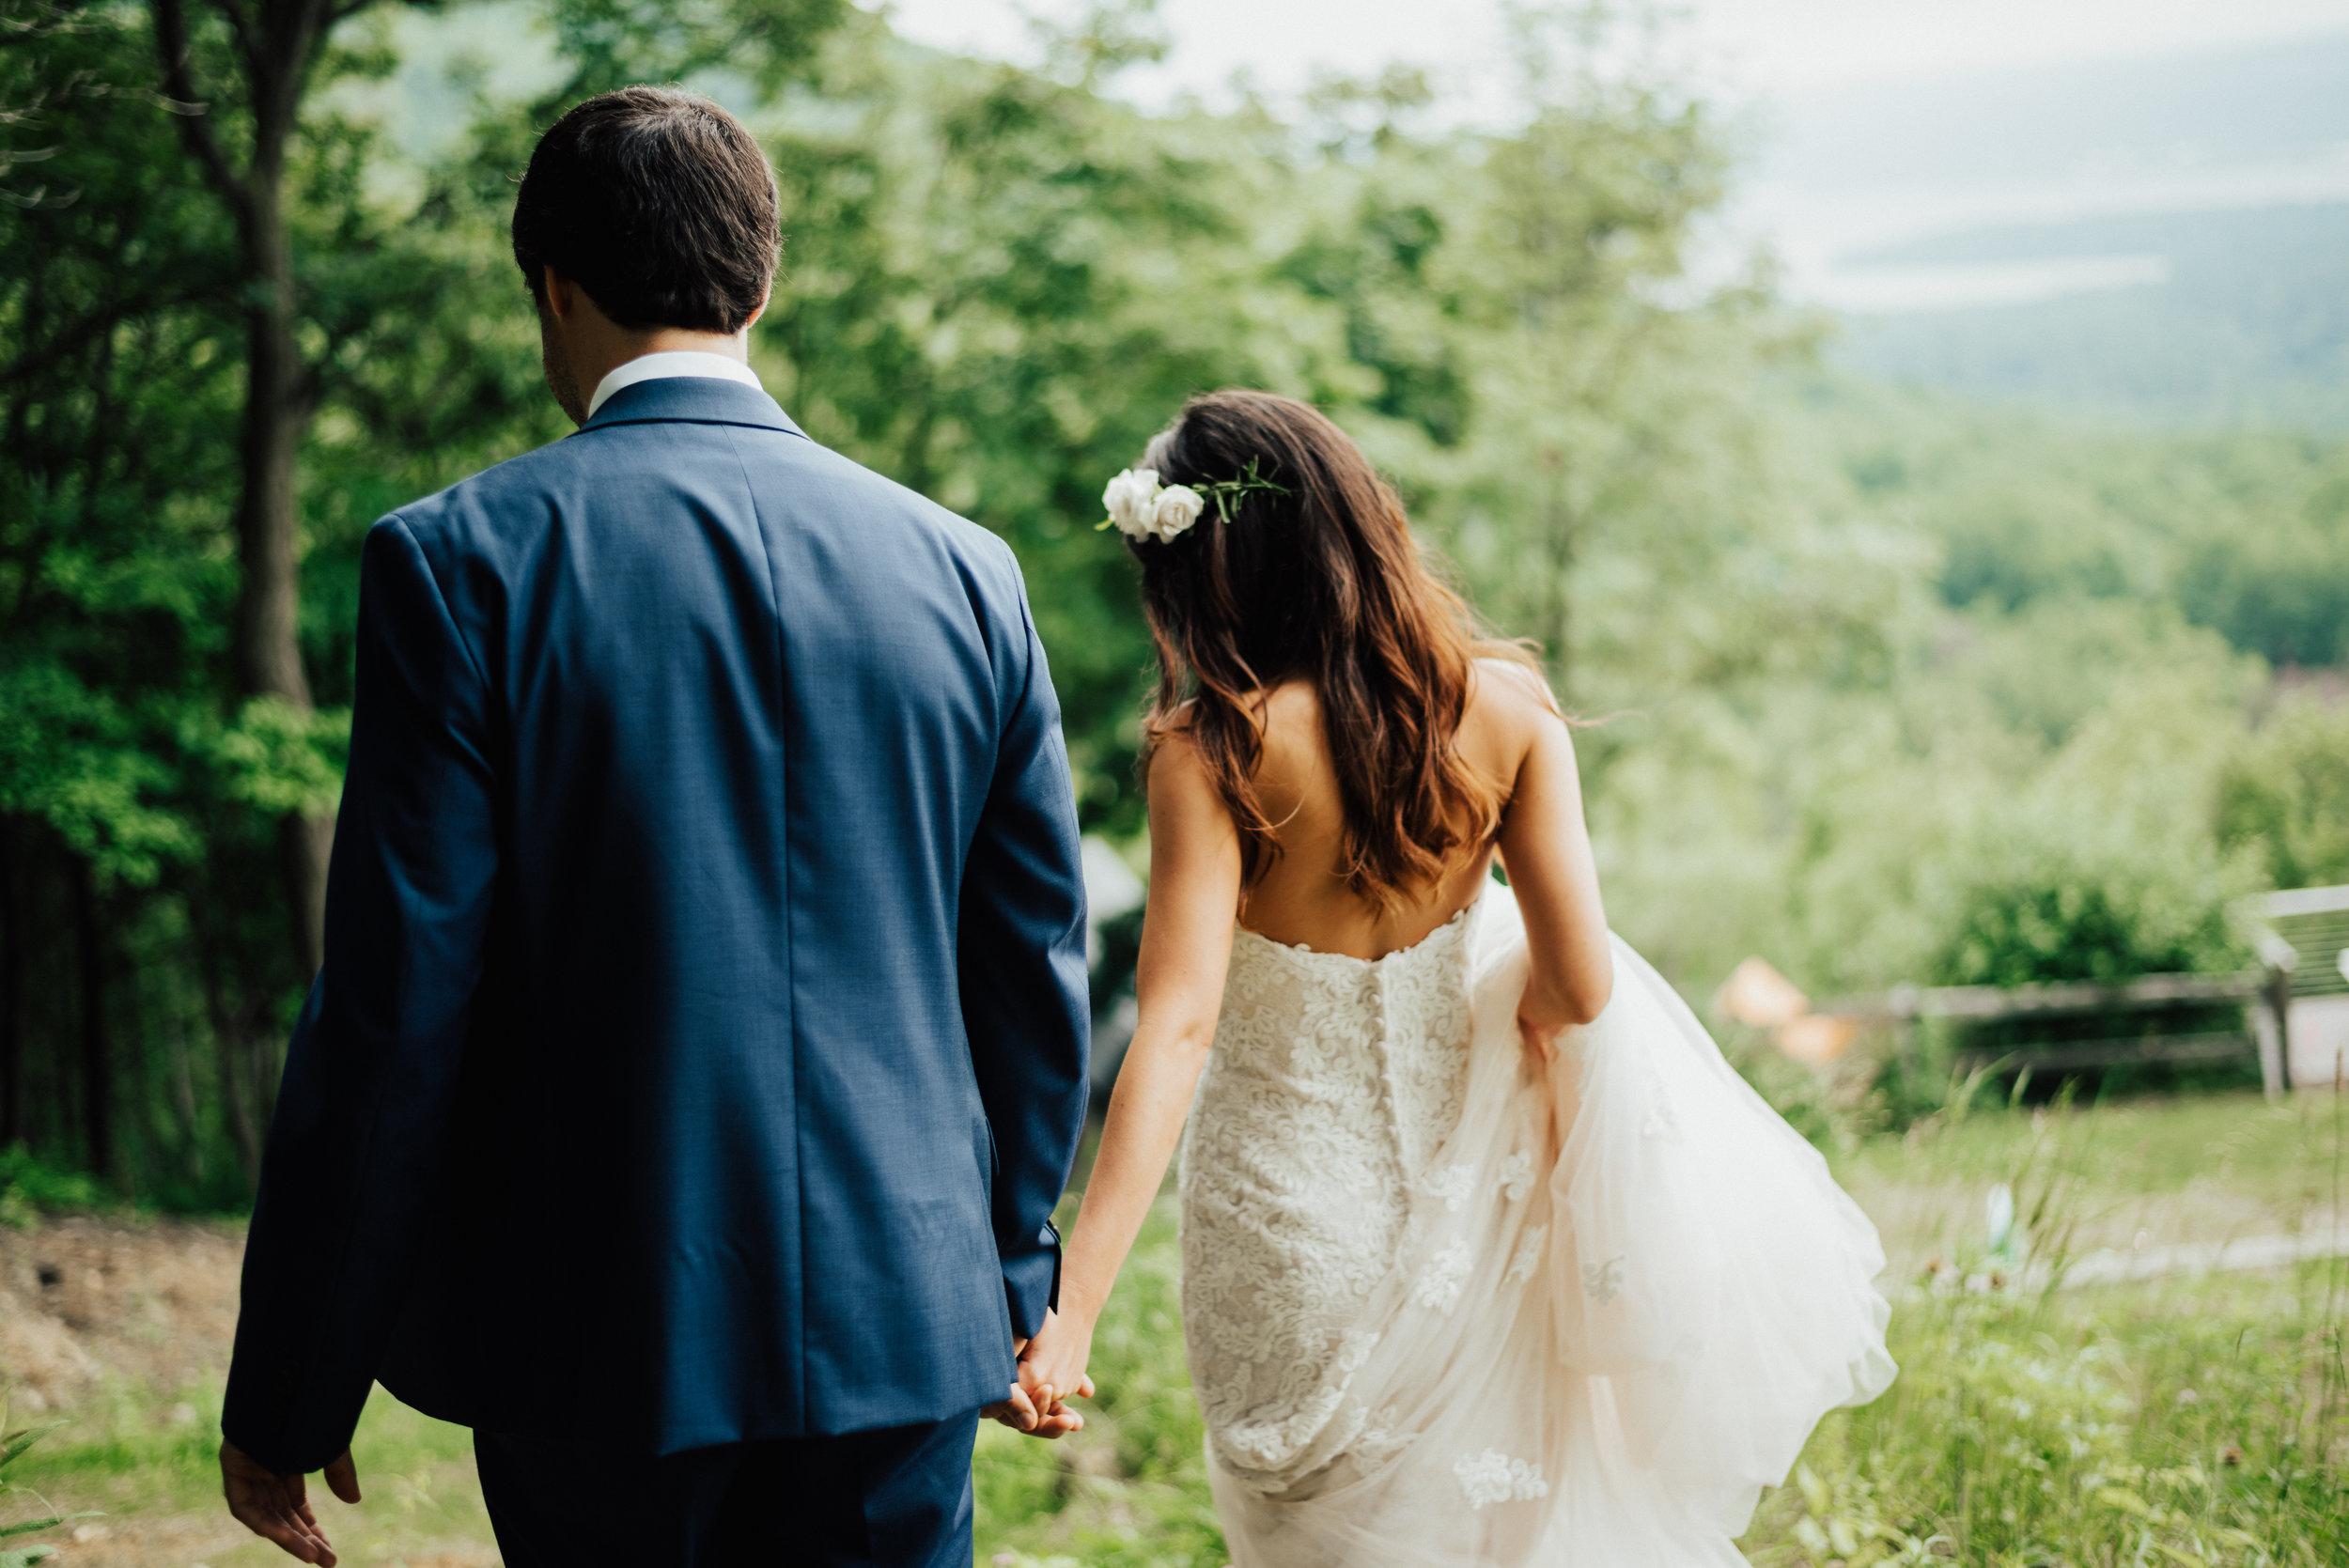 myriah-byron-wedding_pre-ceremony168.jpg